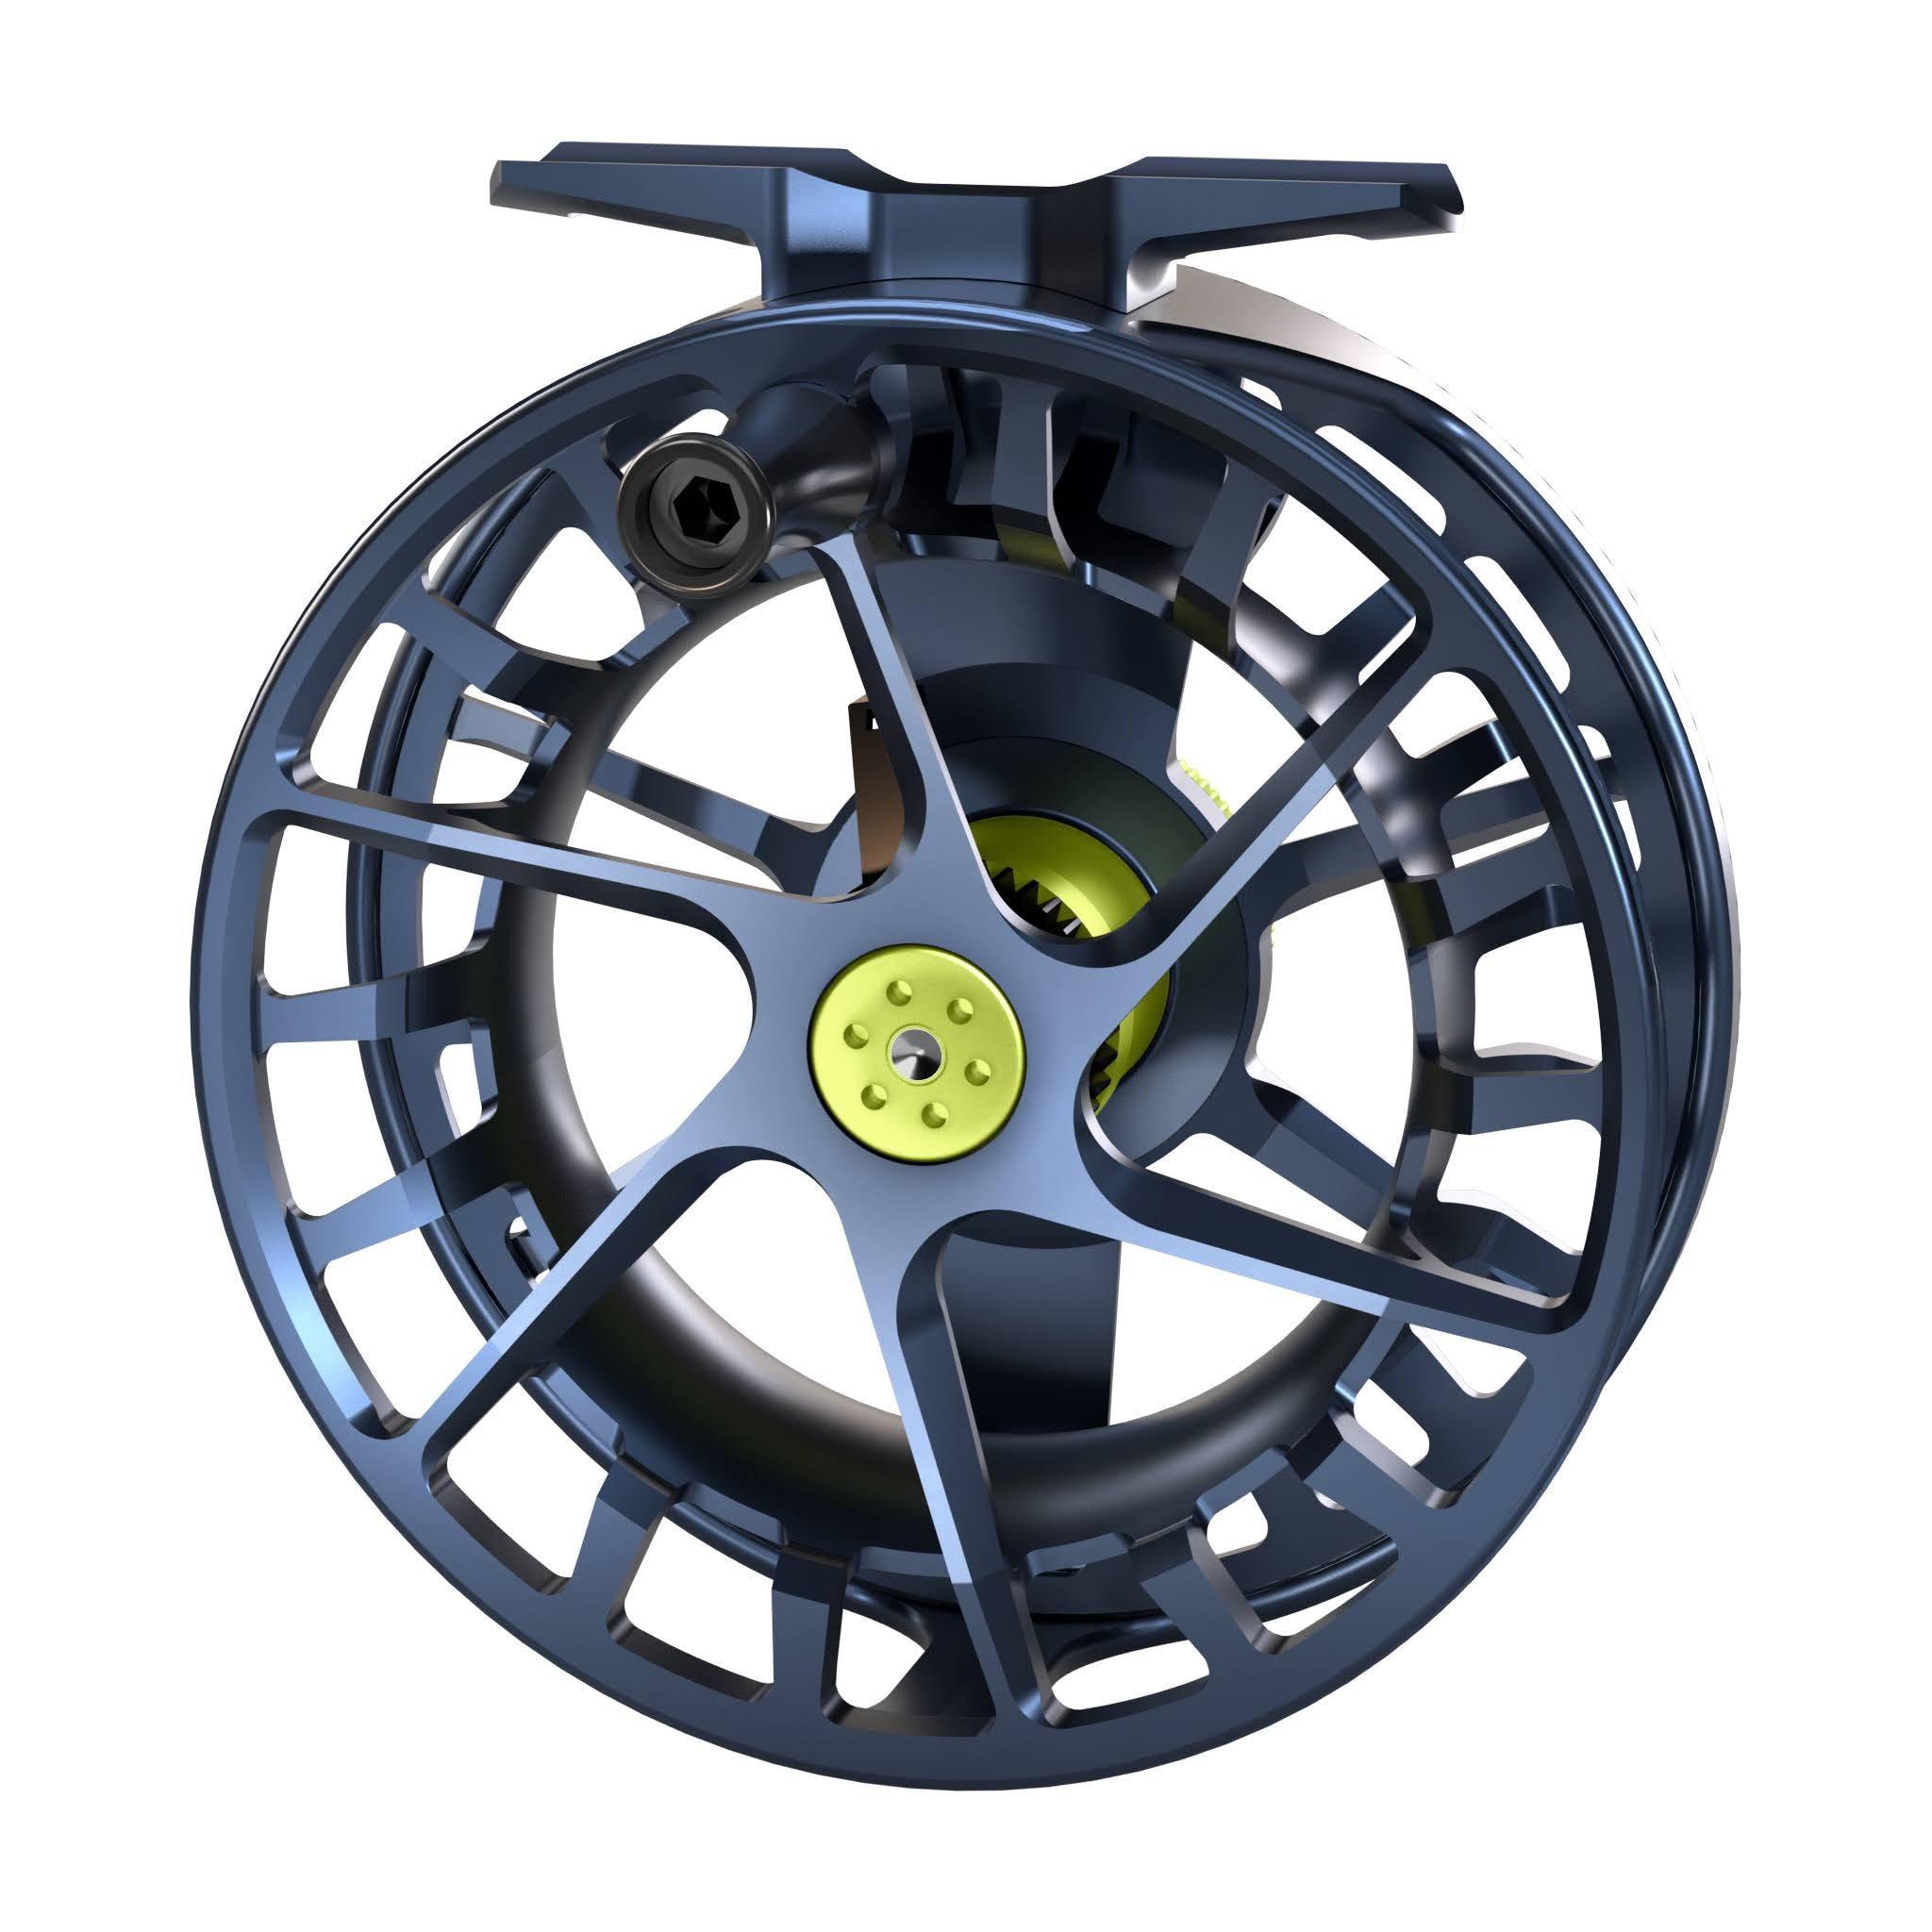 Waterworks Lamson | Speedster S Fly Reel - Midnight / 9+